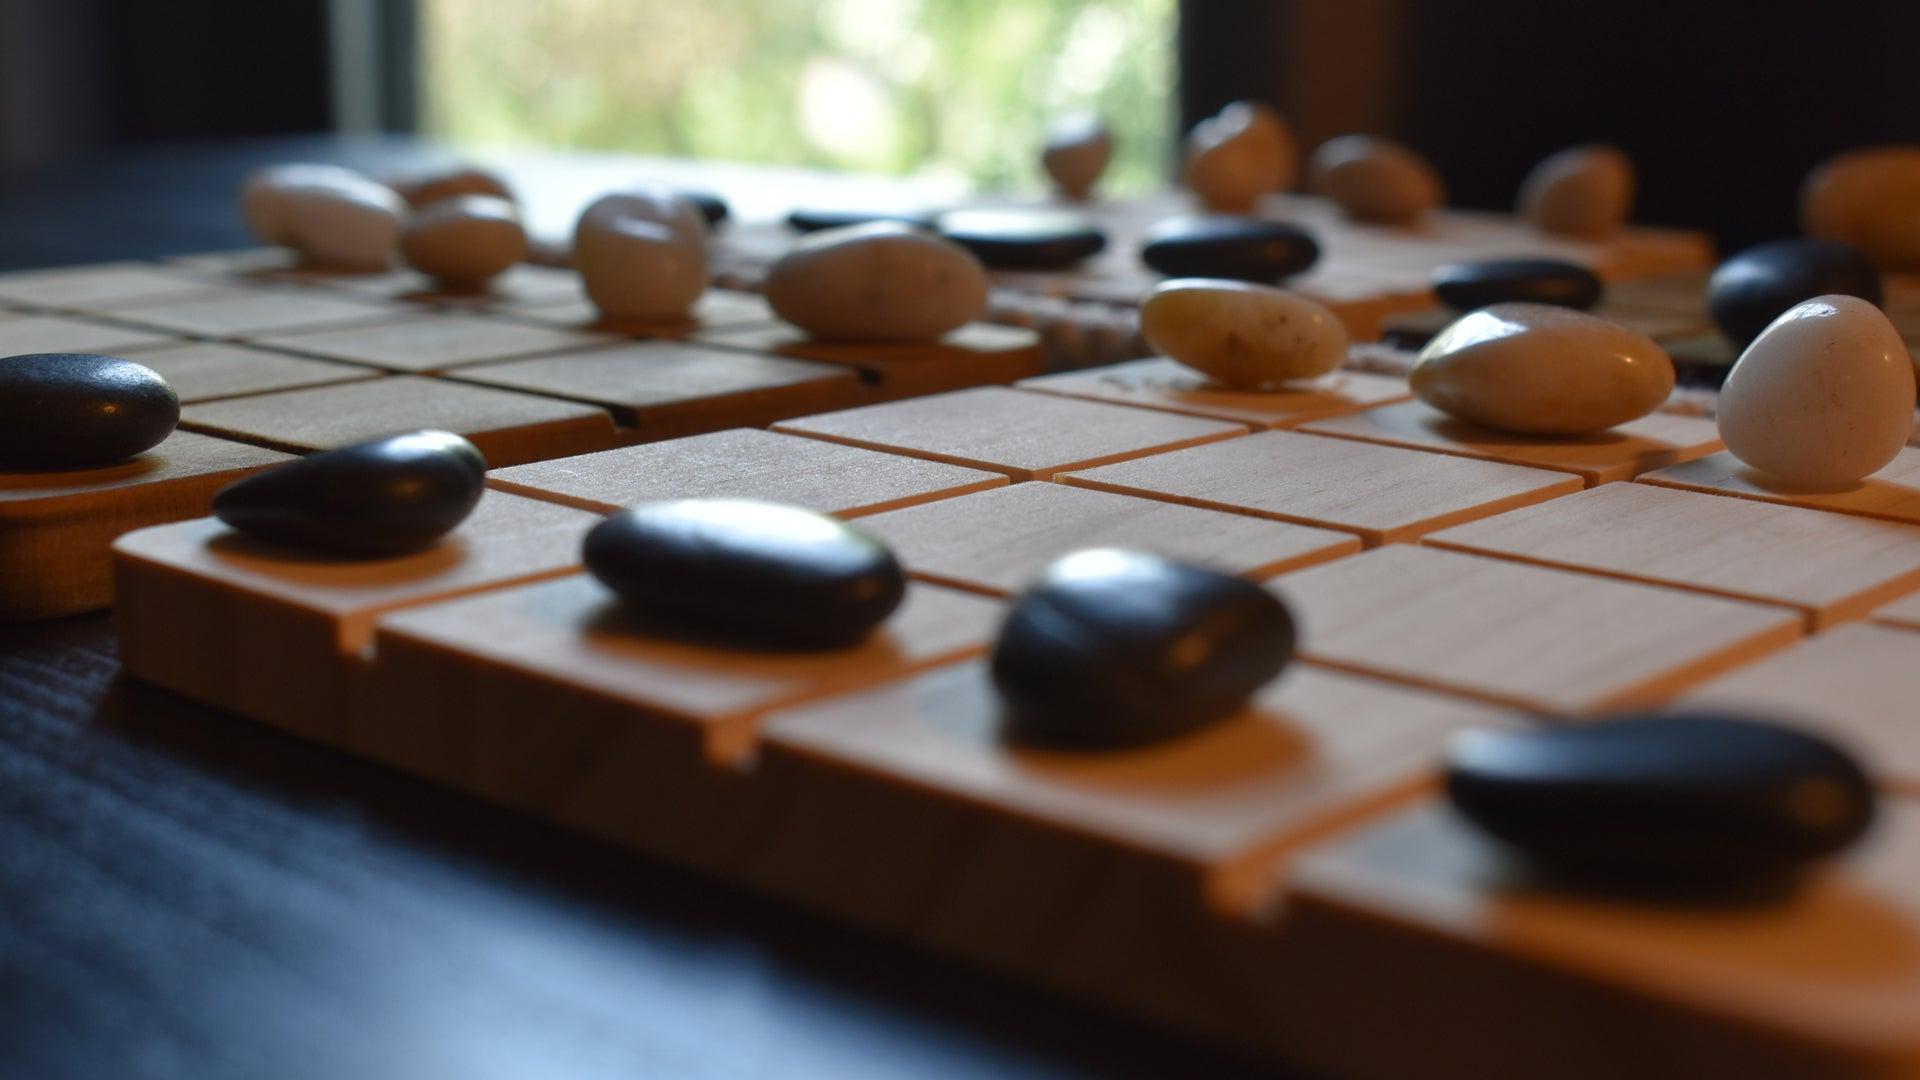 Shobu abstract strategy board game photo